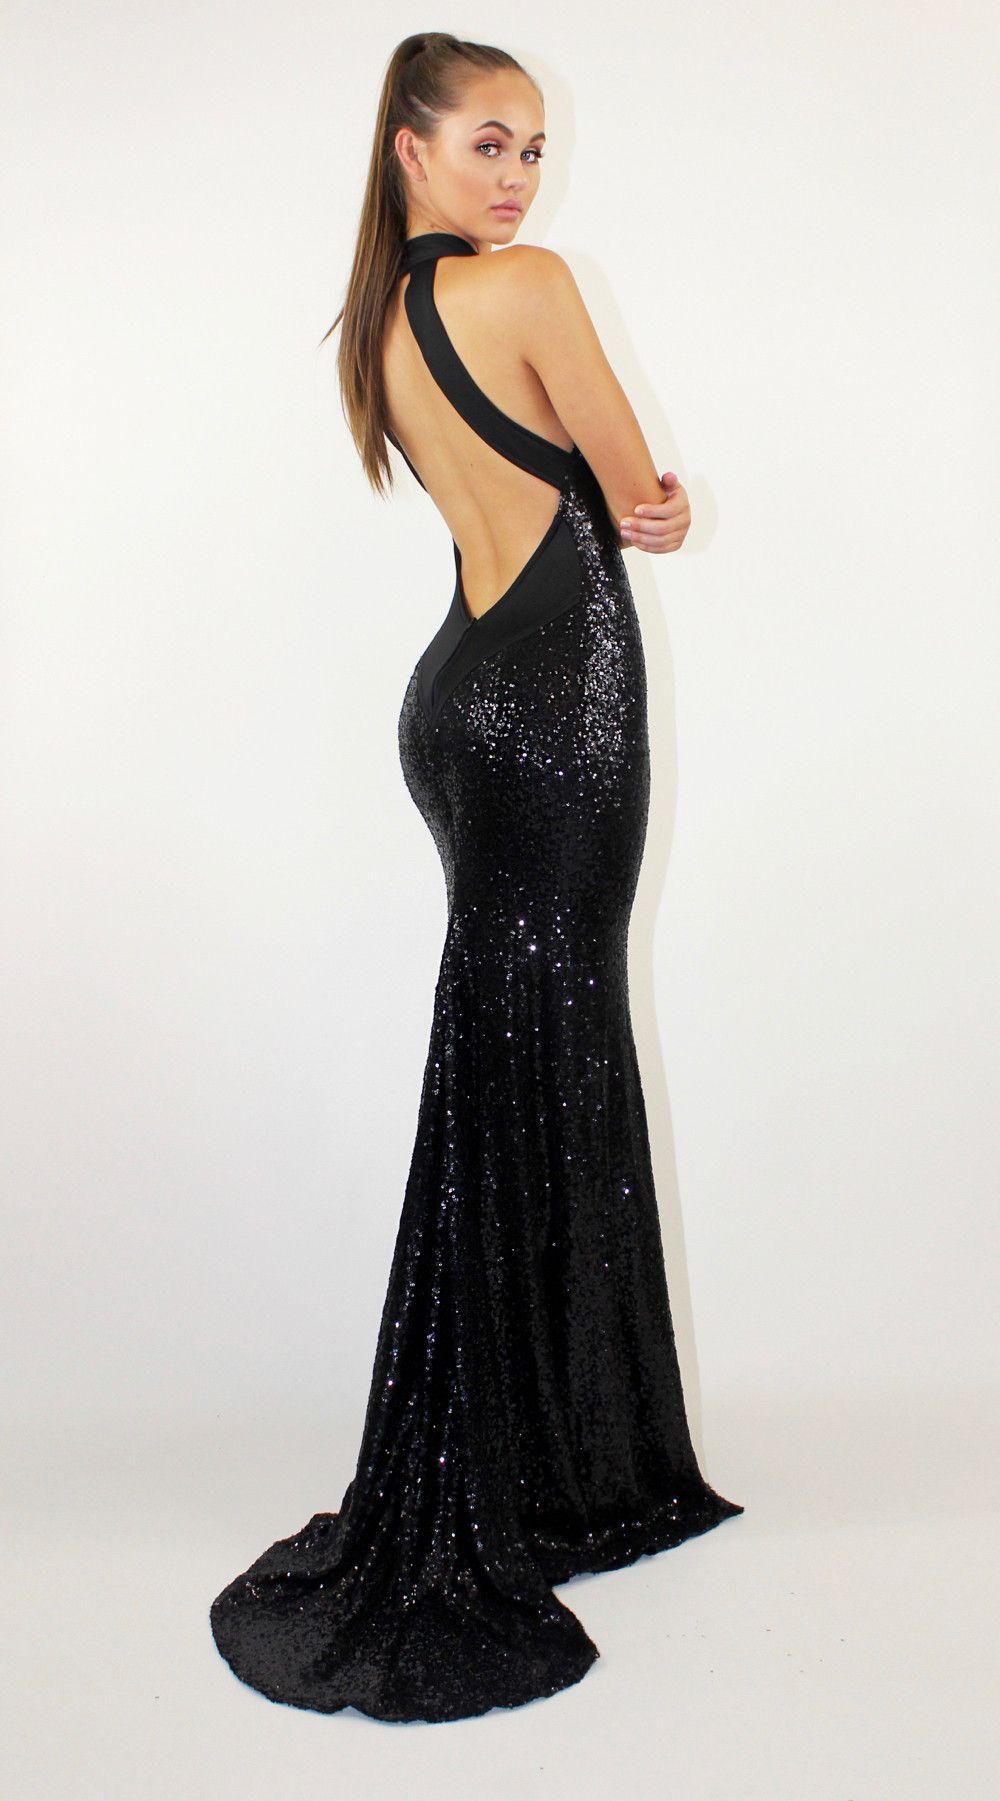 Chloe black tightuelegent pinterest red carpet formal and sequins